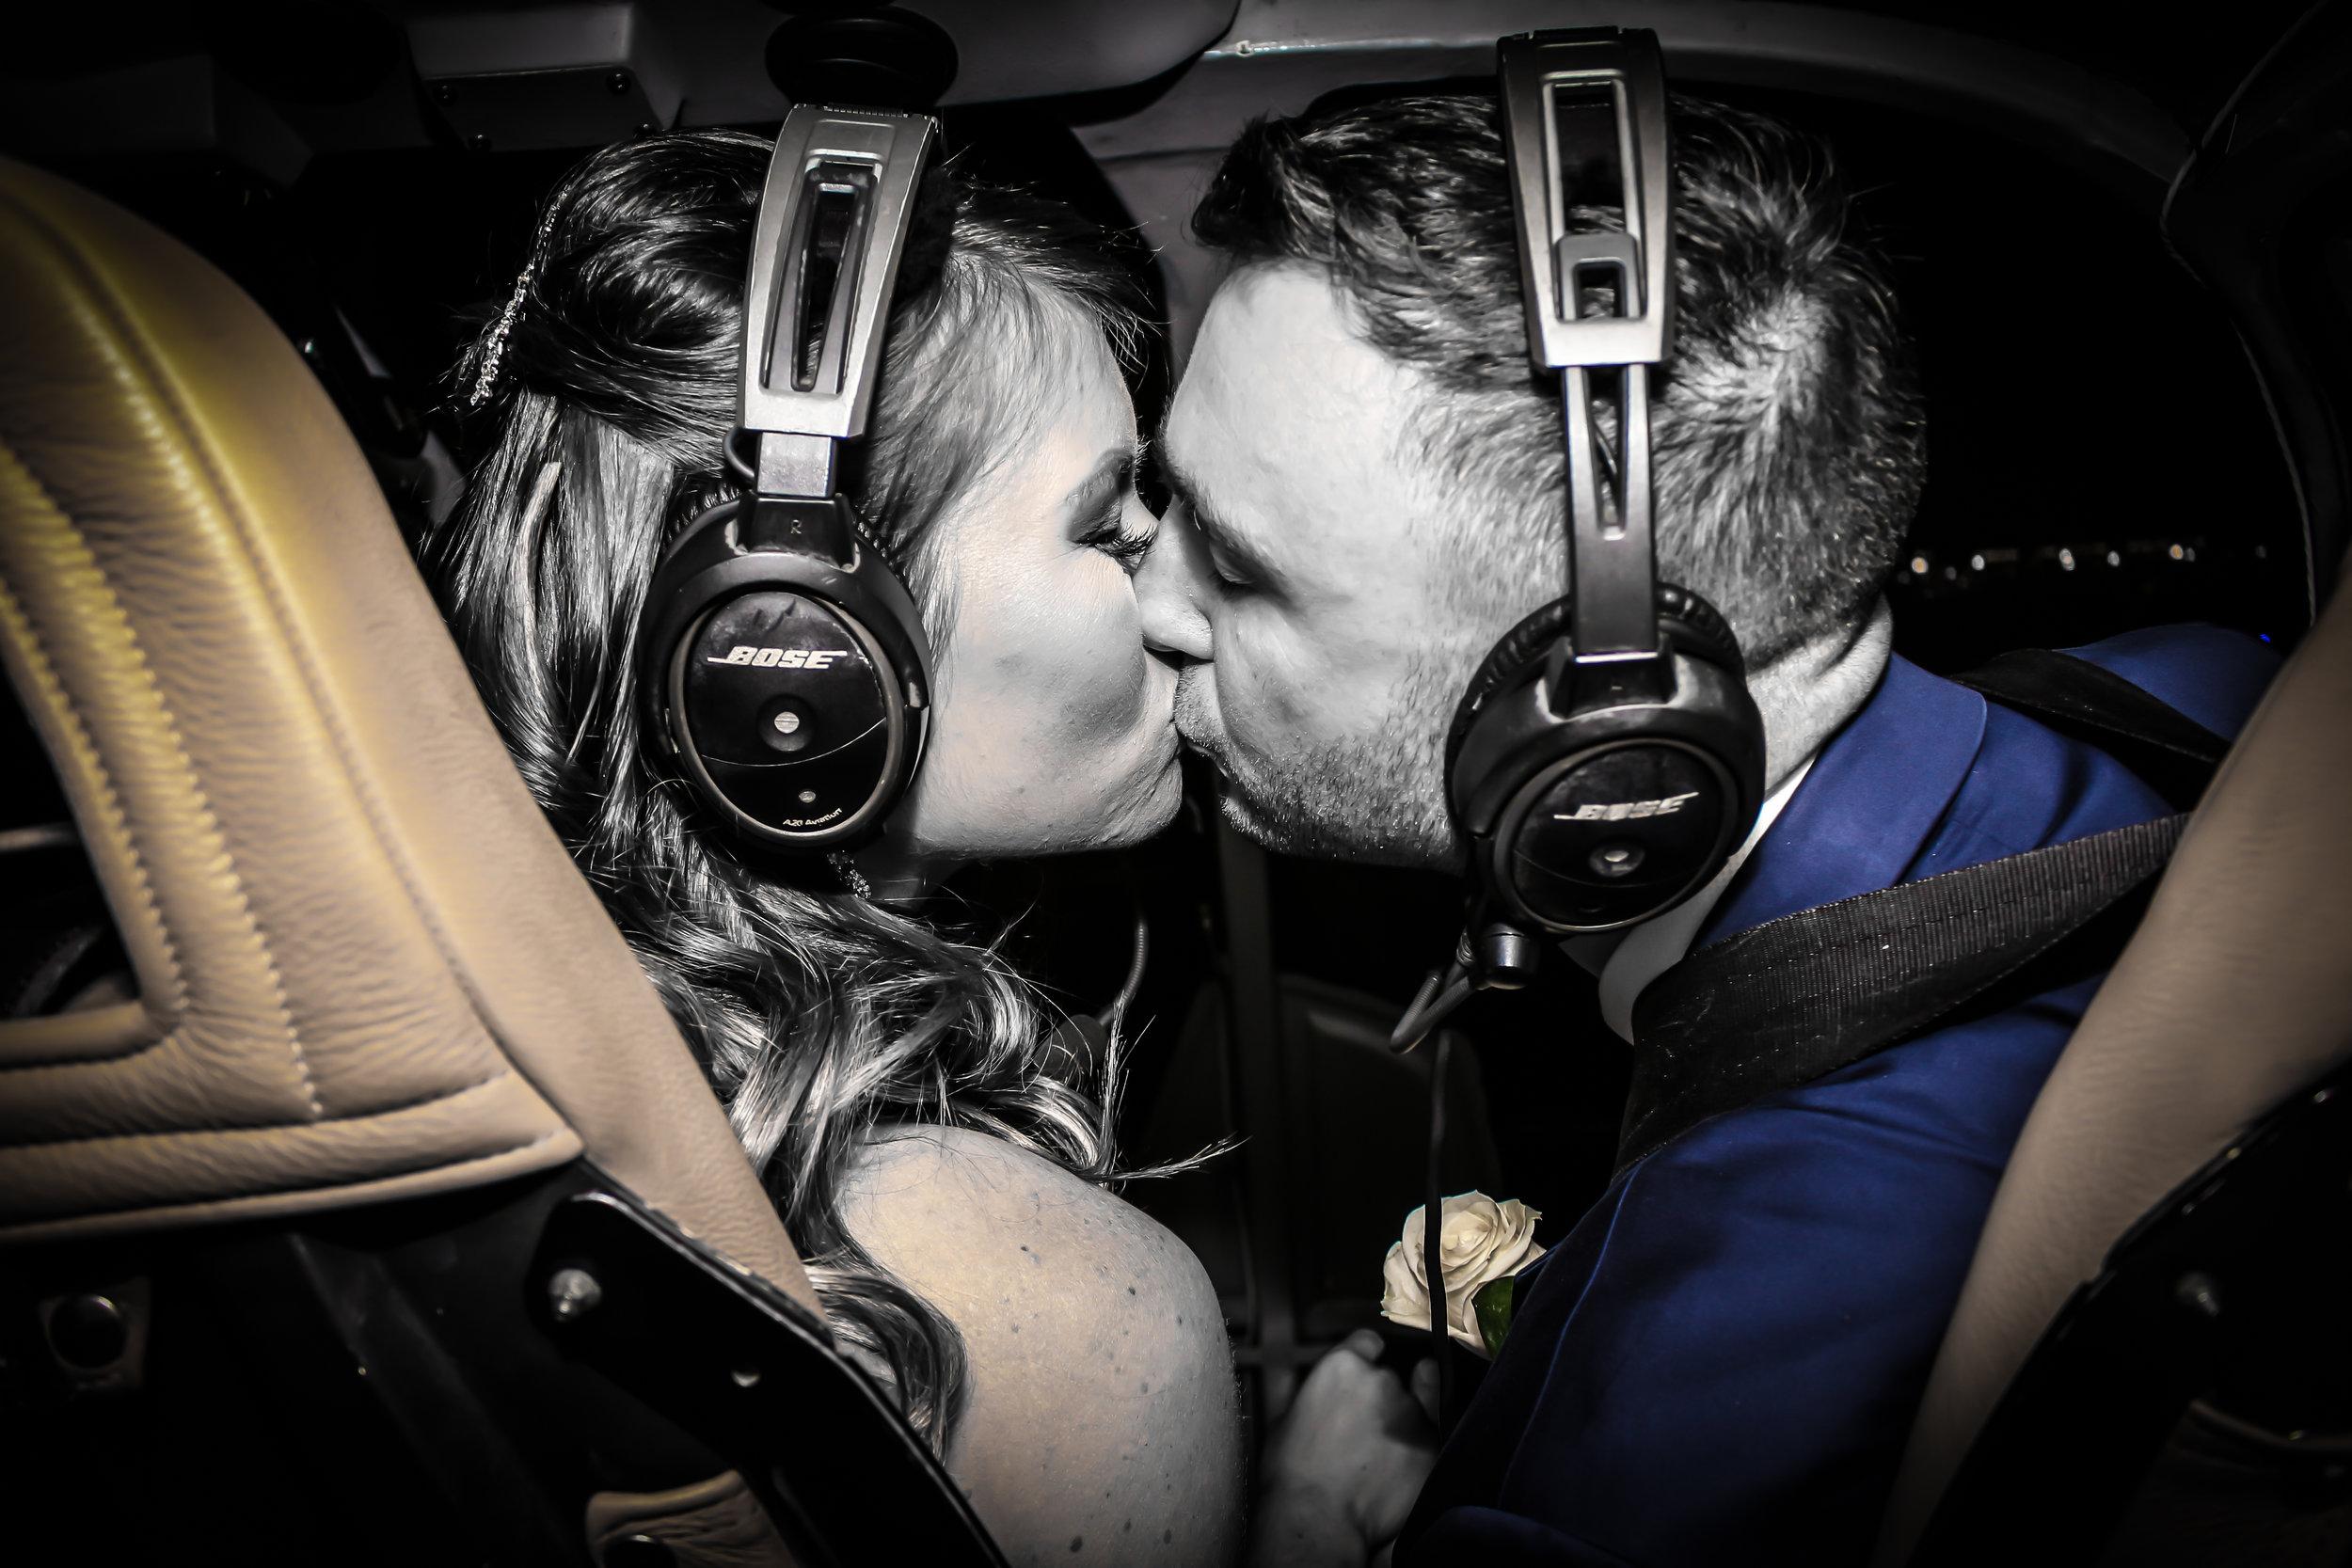 Helicopter wedding ceremony